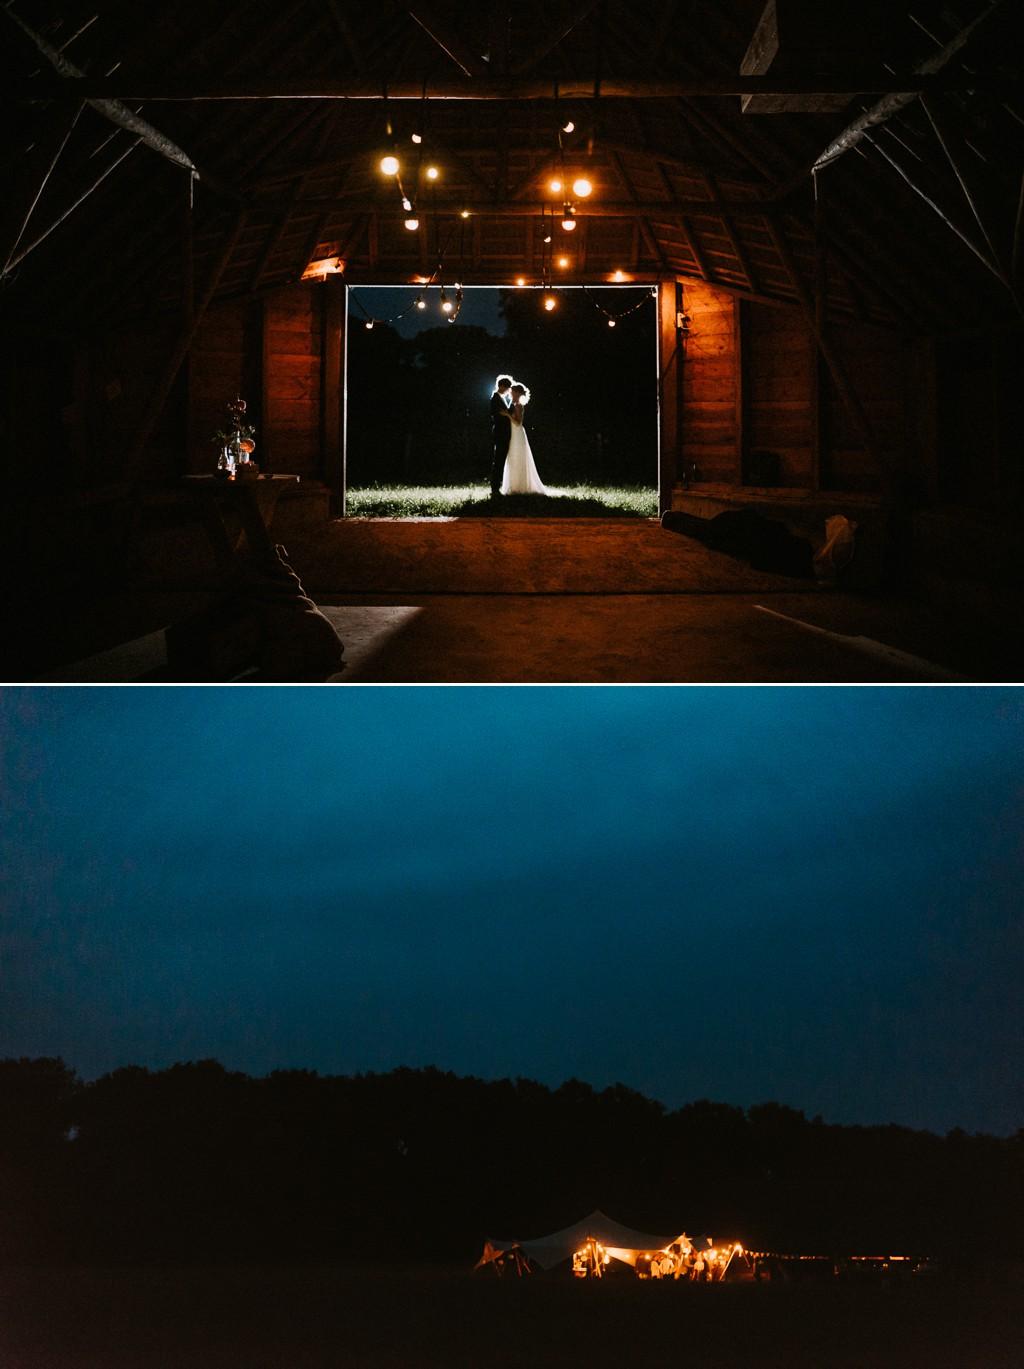 trouwfotograaf-rotterdam-trouwen-in-het-bos-arnhem-fotografie-steef-utama-w-w-15